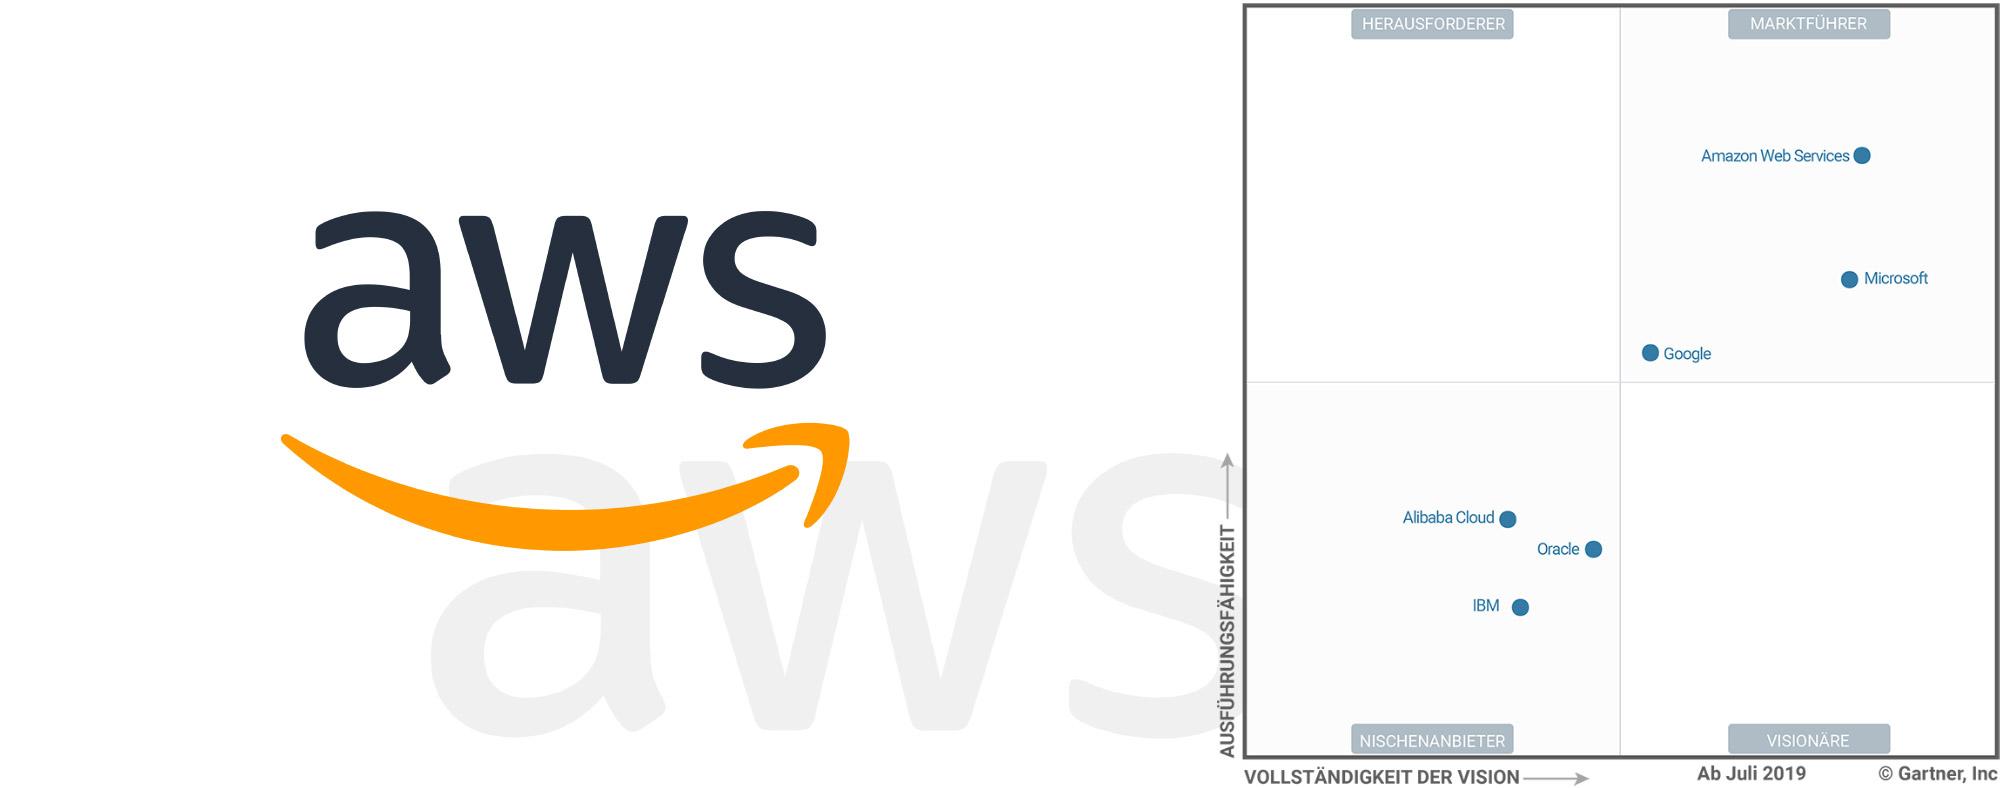 Amazon Web Services - Magic Quadrant von Gartner 2019